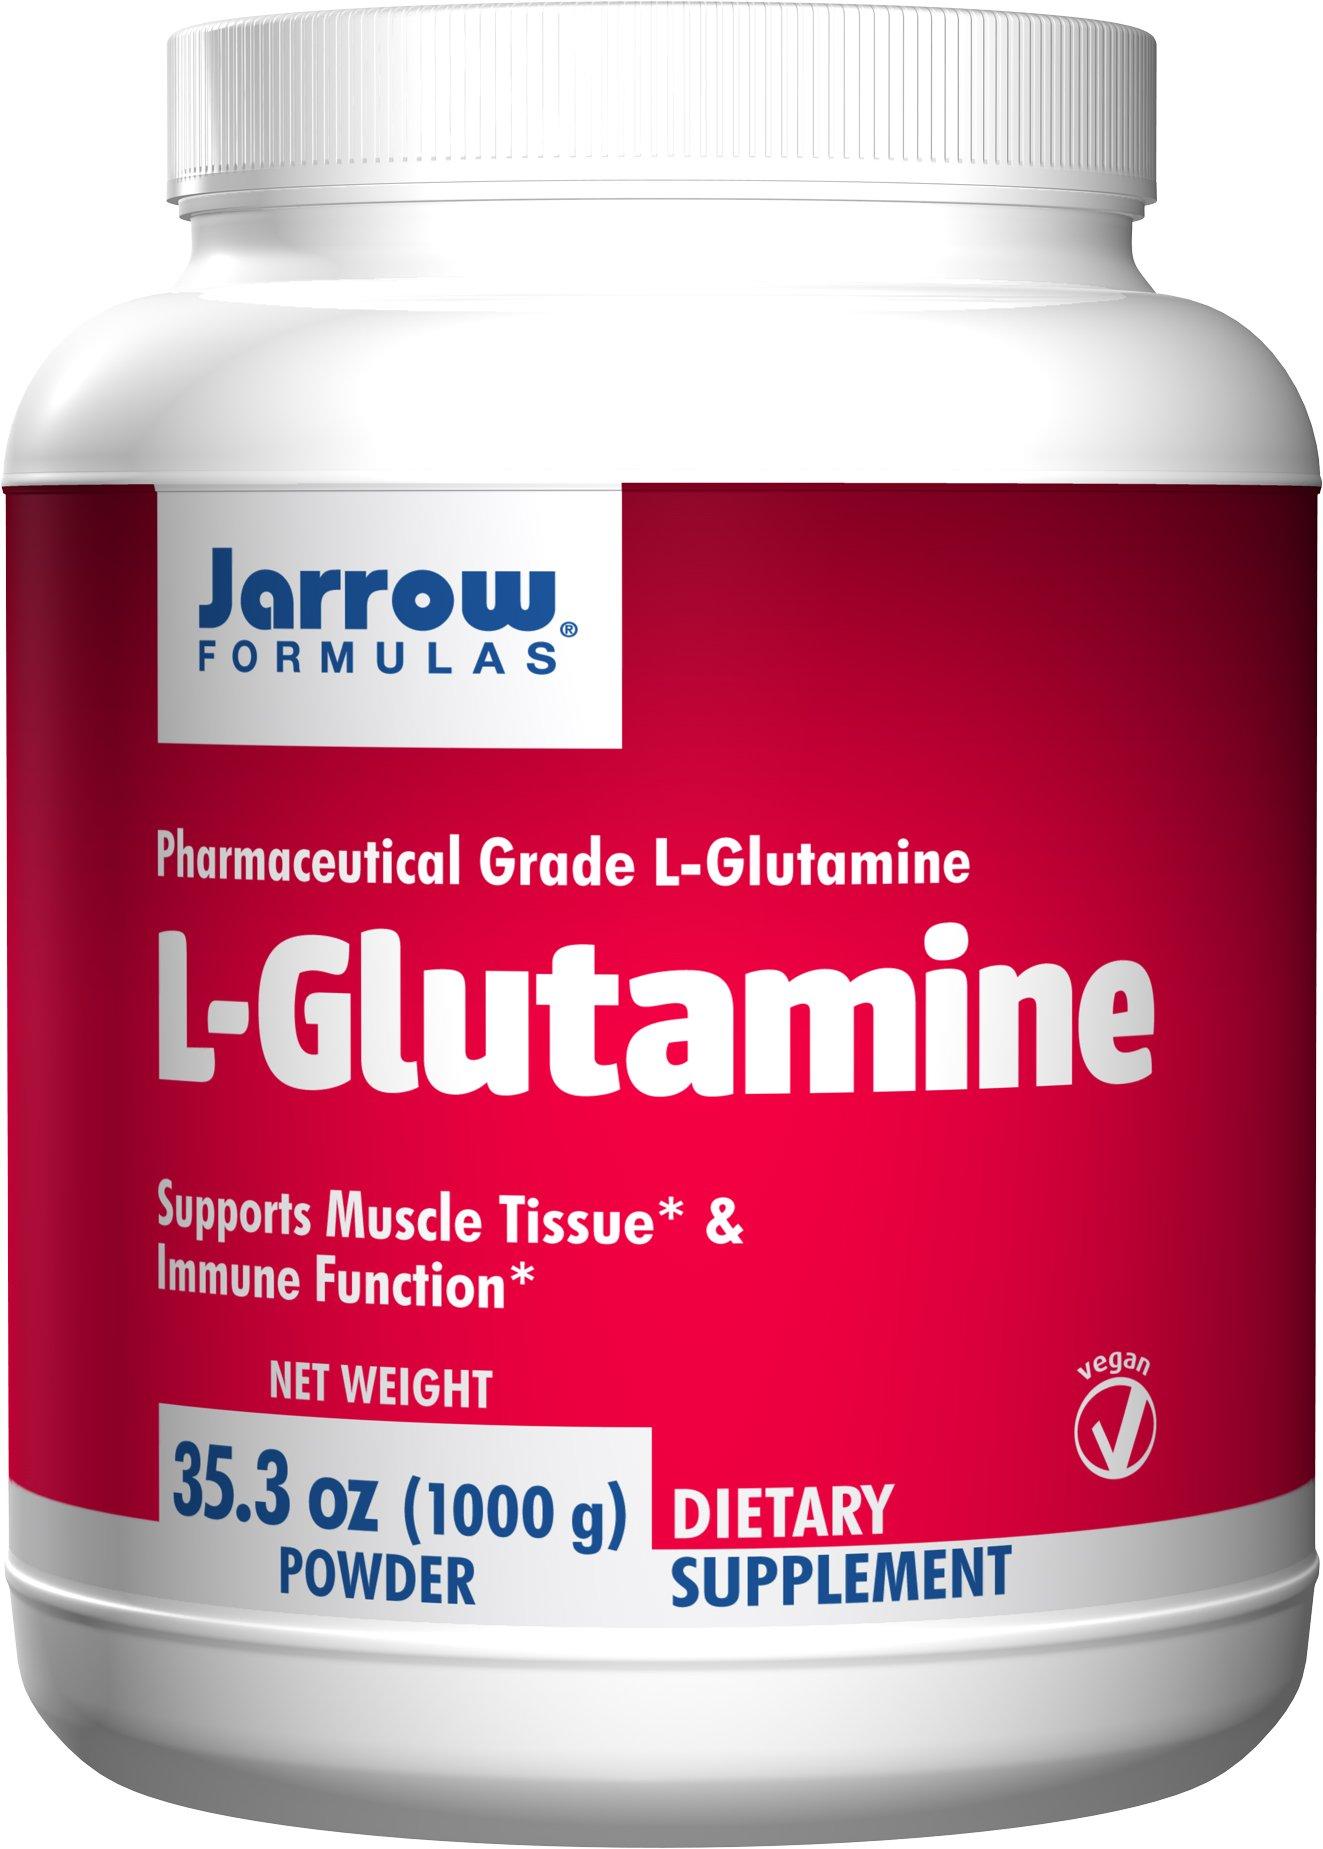 Jarrow Formulas - Jarrow Formulas, L-Glutamine, 35.3 oz (1000 g) Powder (TRIPLE PACK) (Pack of 3)